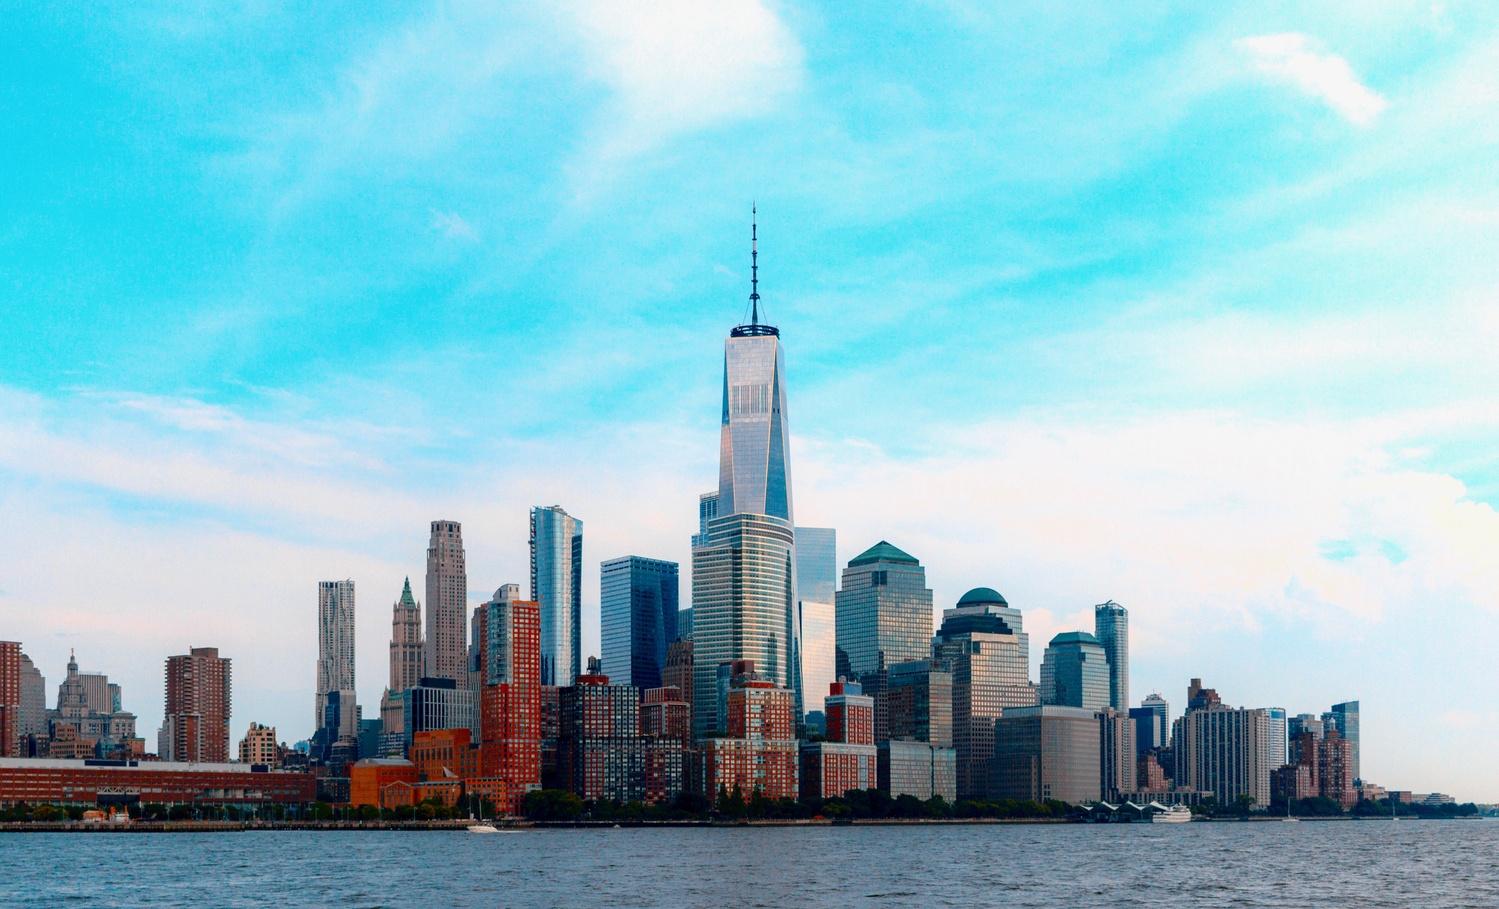 Downtown New York City by Kush Shah